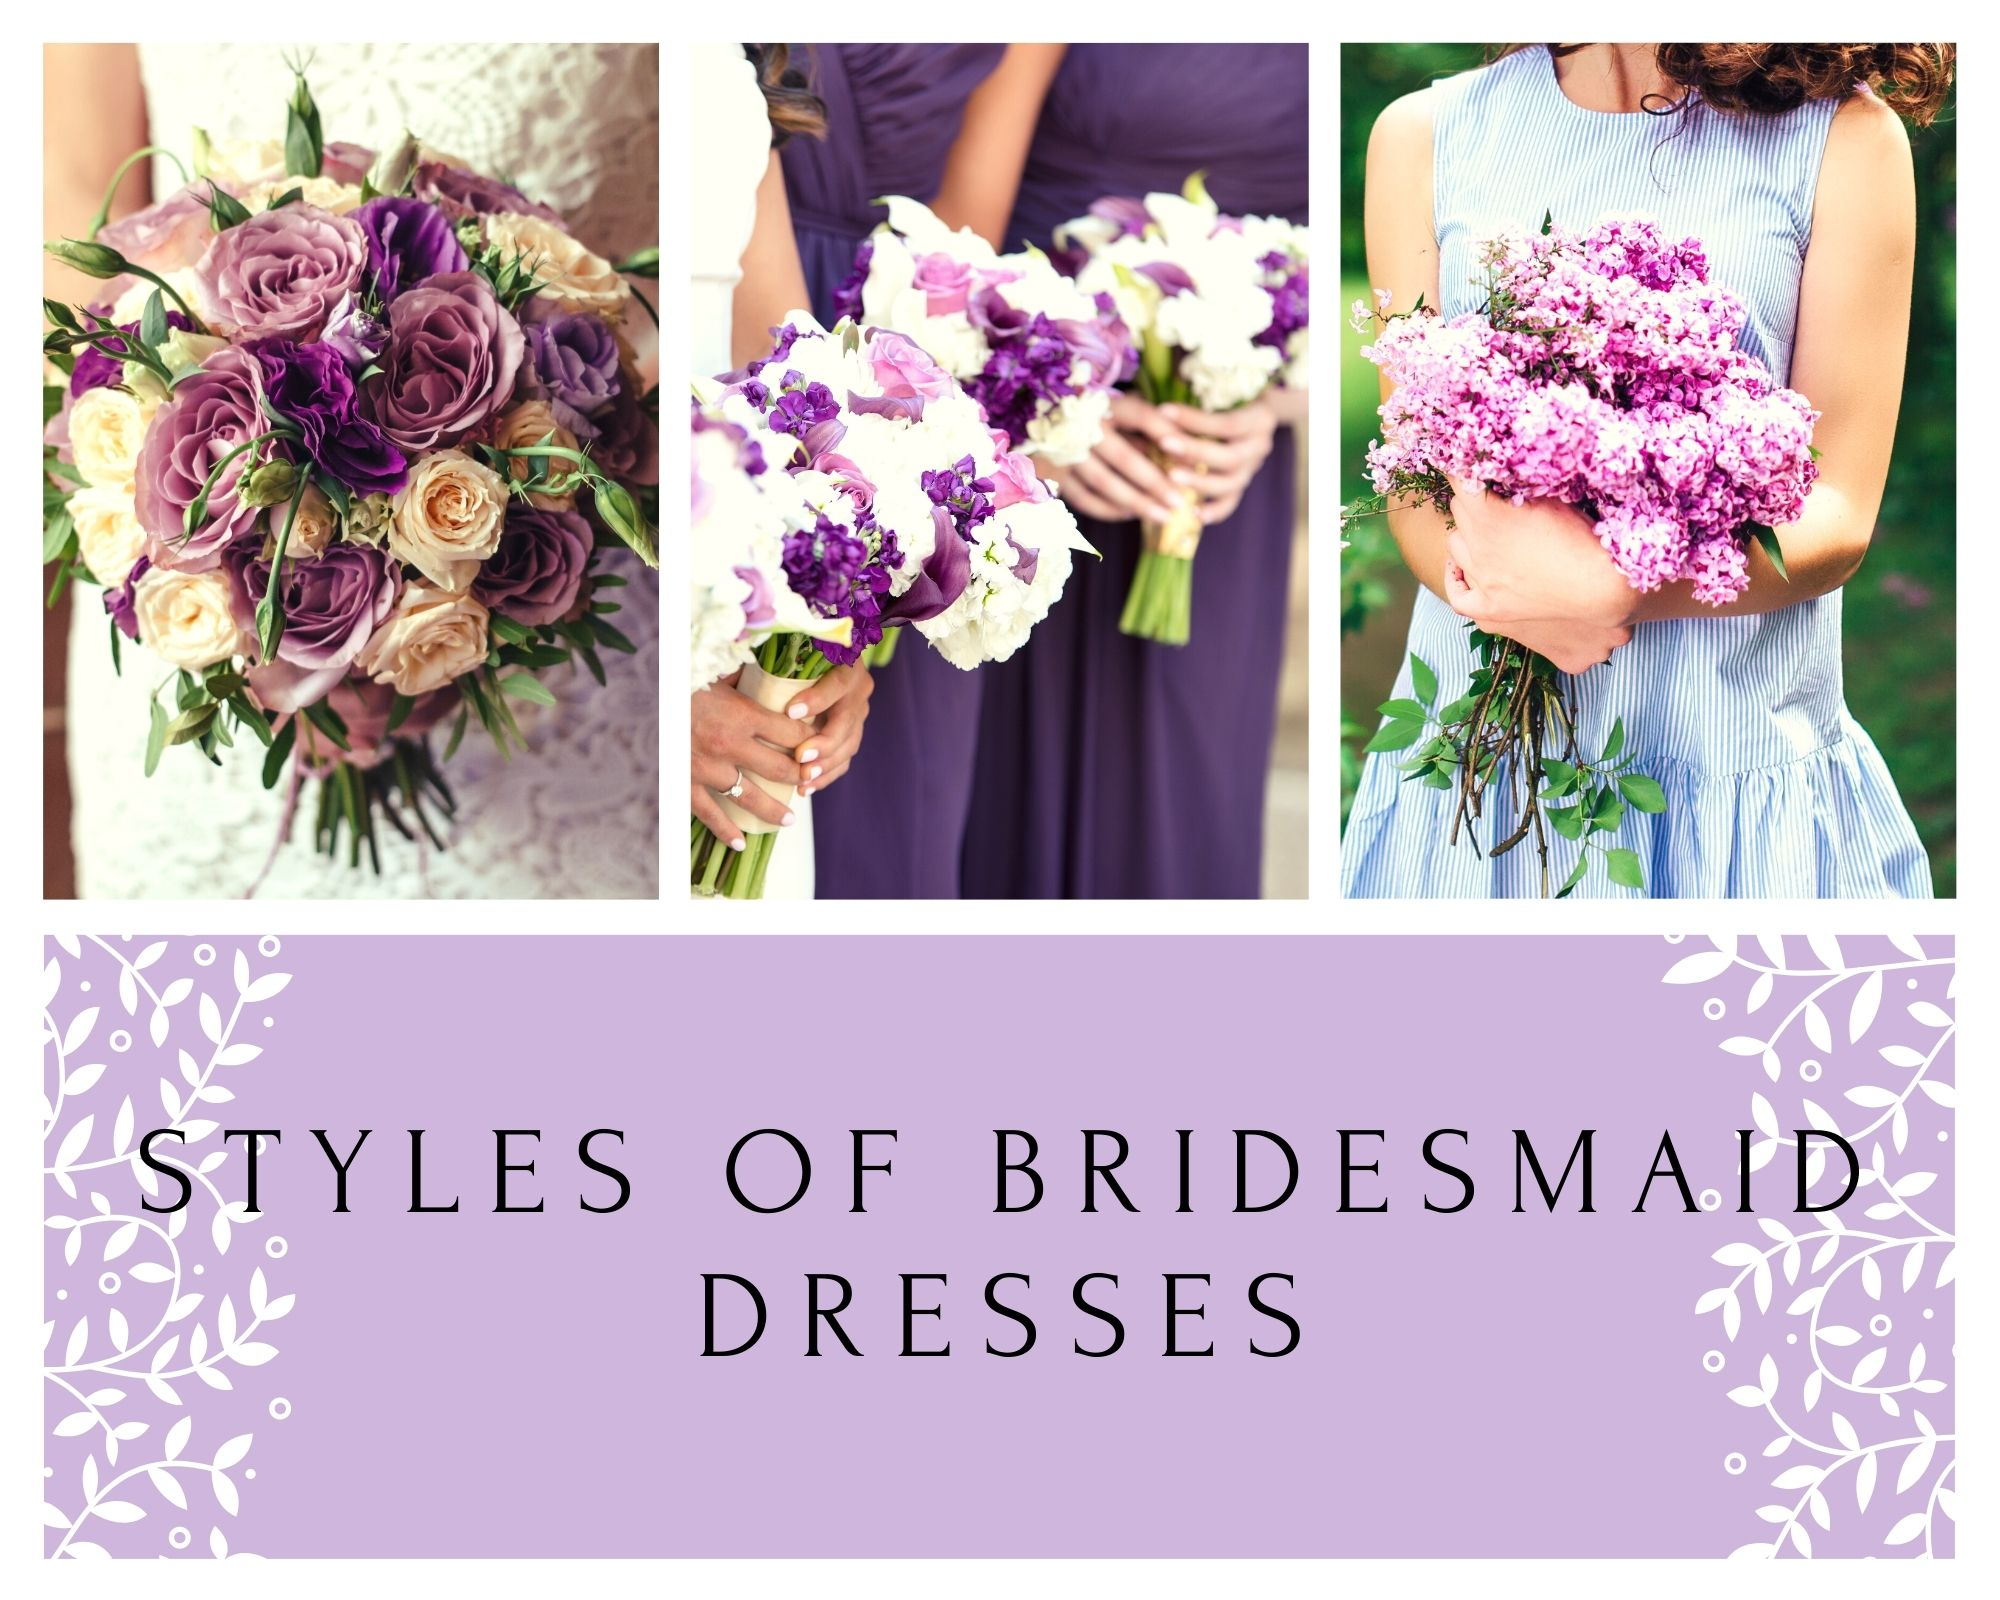 Top 7 Best Styles of Bridesmaid Dresses